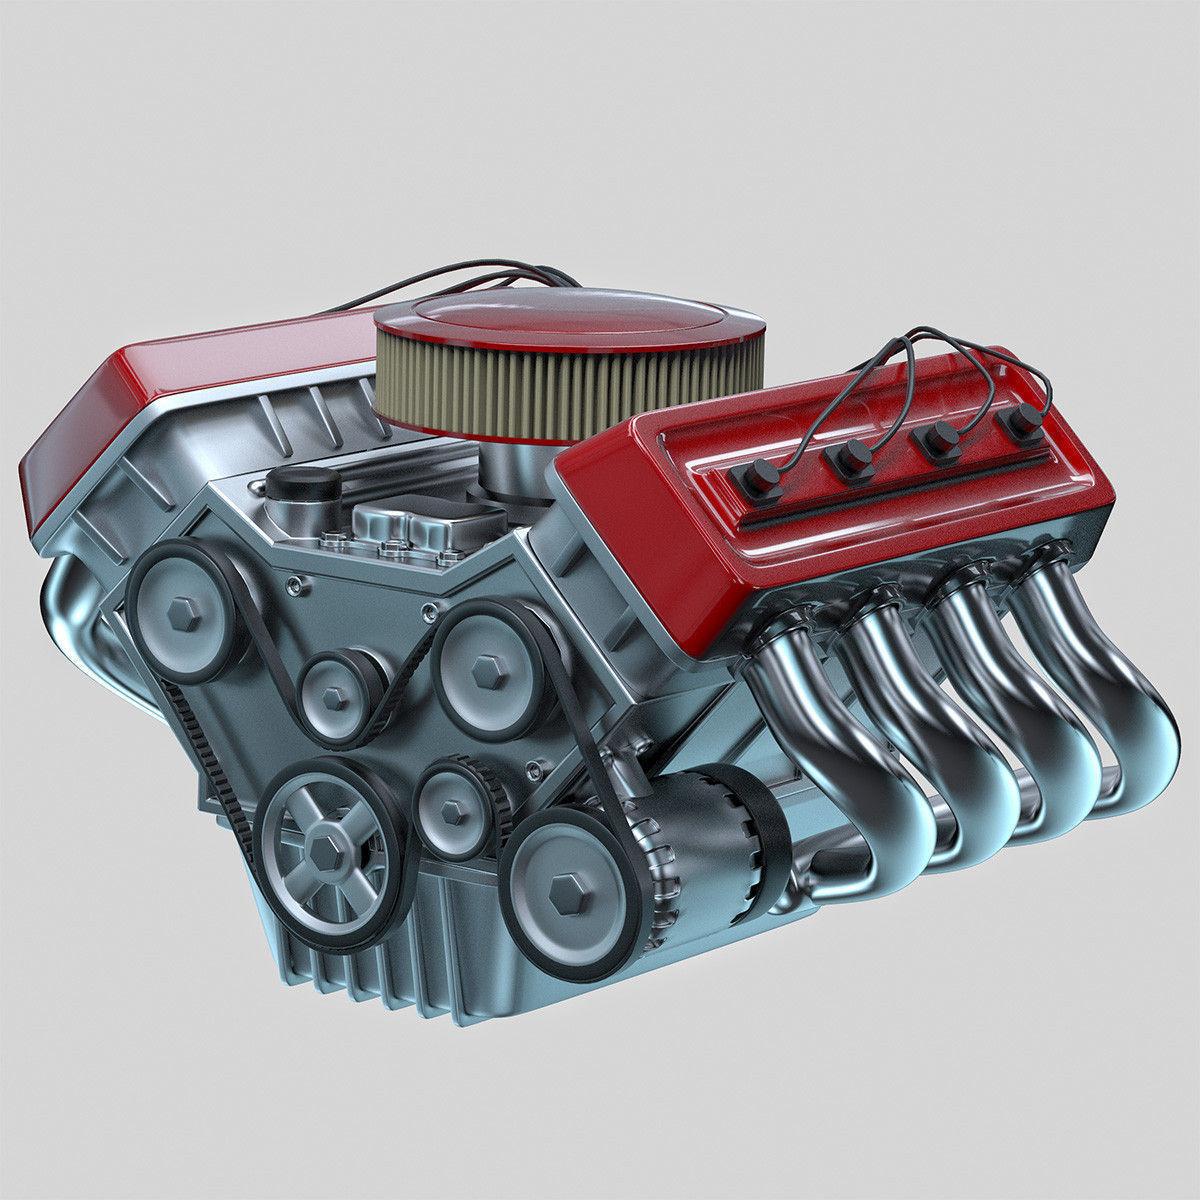 ⚡ Rigged car model free download | Rigged Car  2019-07-02